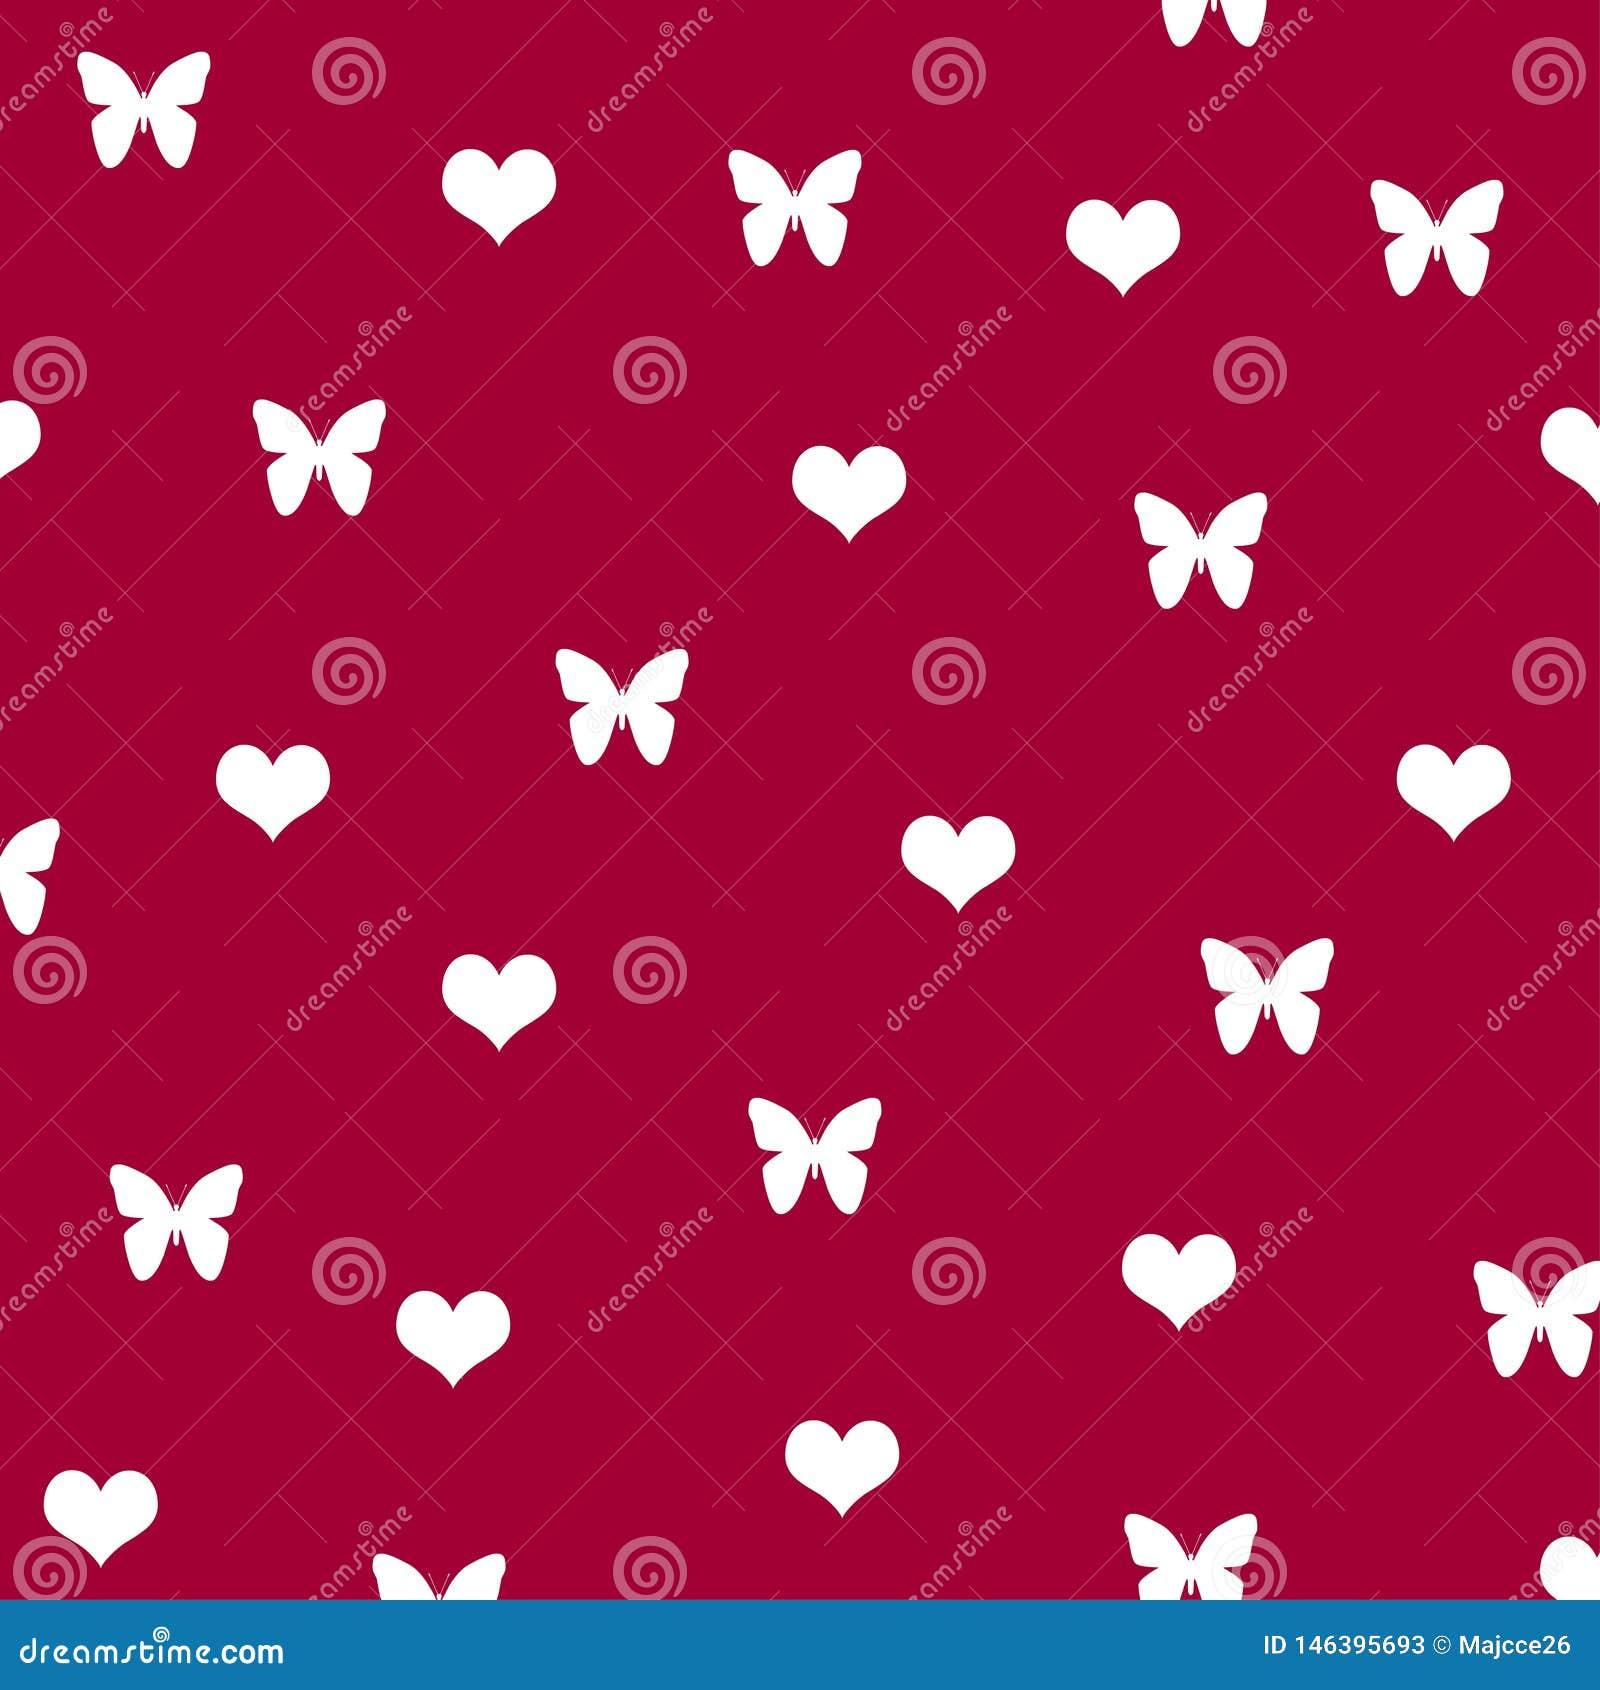 Background Pattern White Butterfly Heart Love Cute Wallpaper Stock